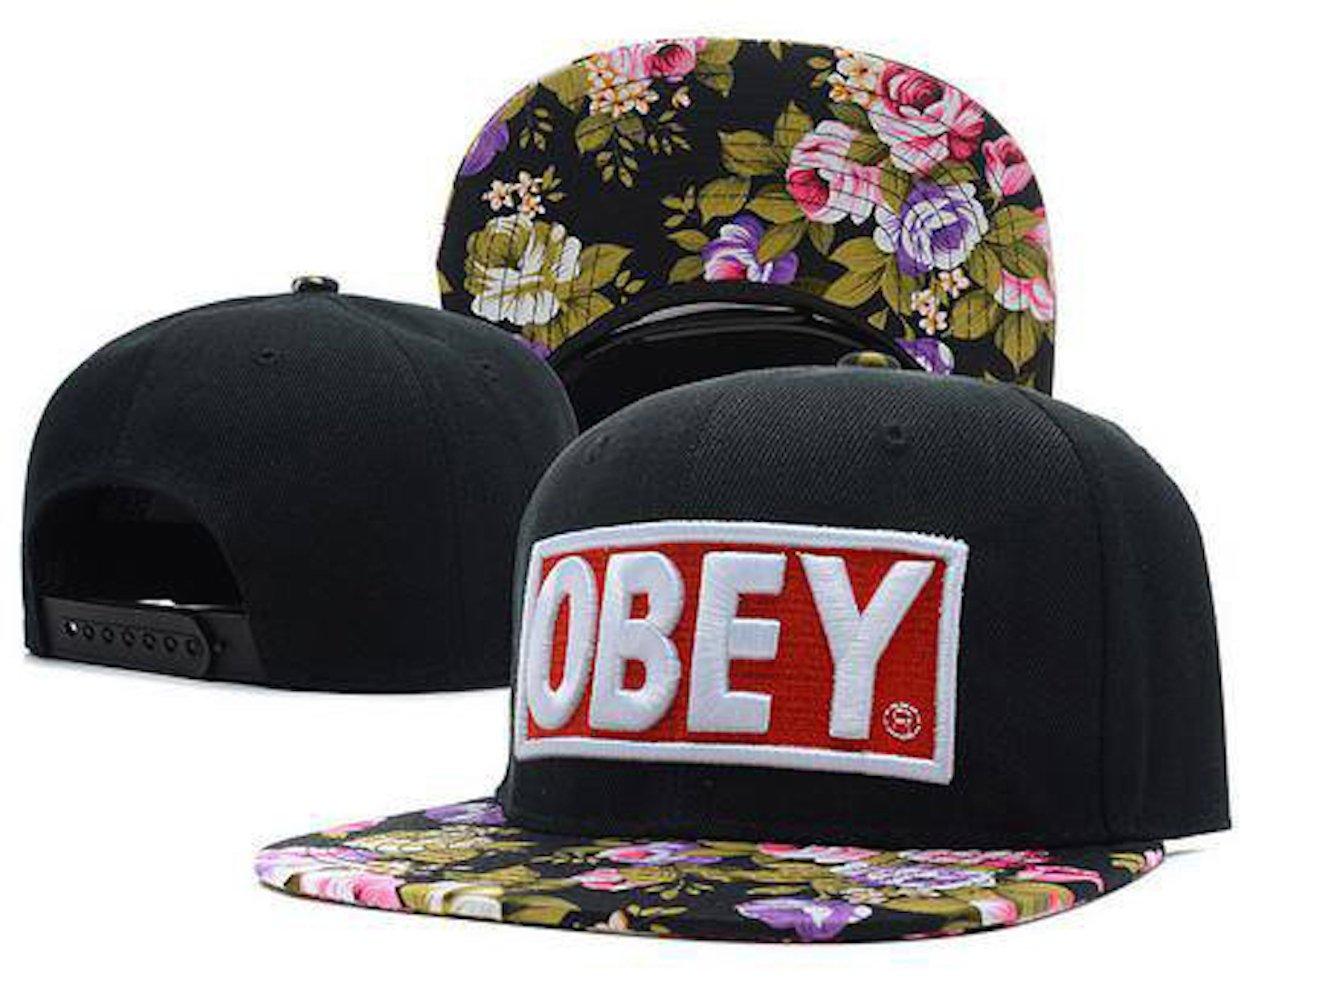 Obey Snapback Cap Gorra snake Hat Tisa Yolo Swagg Ymcmb Lil Wayne ...